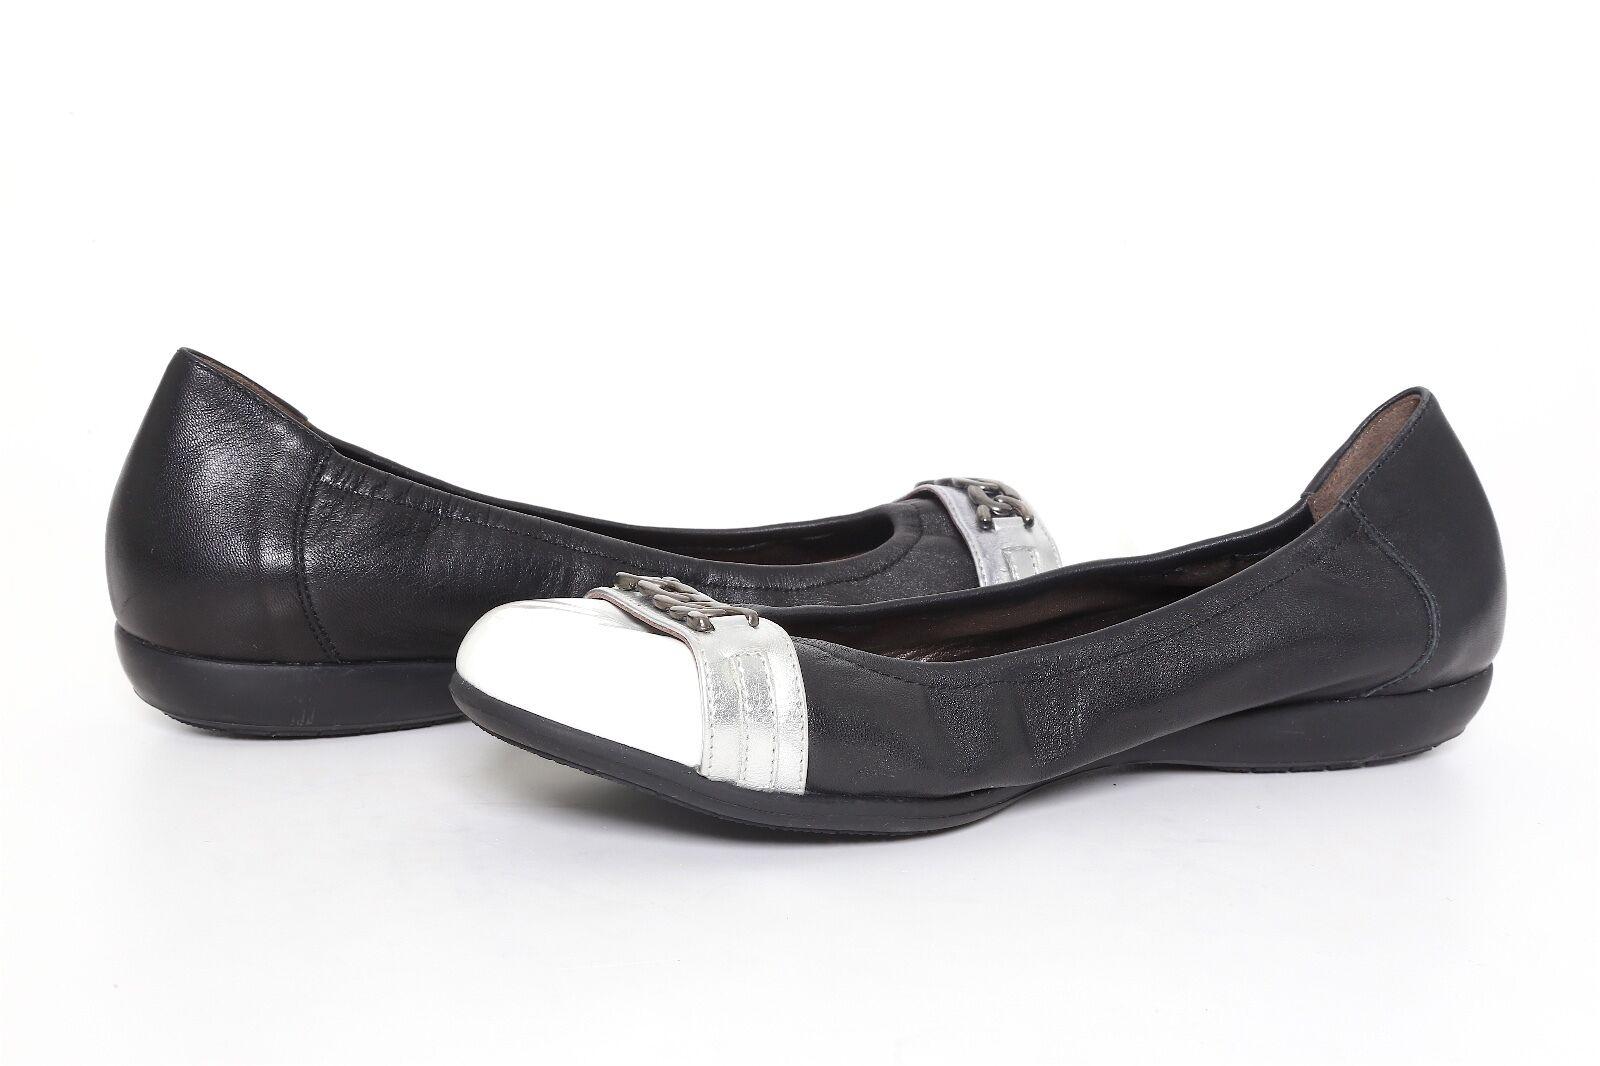 Mephisto Women's Black White White White Leather Ballet Cap Toe Flats 1785 Sz 10 US 7.5 EUR 58d917